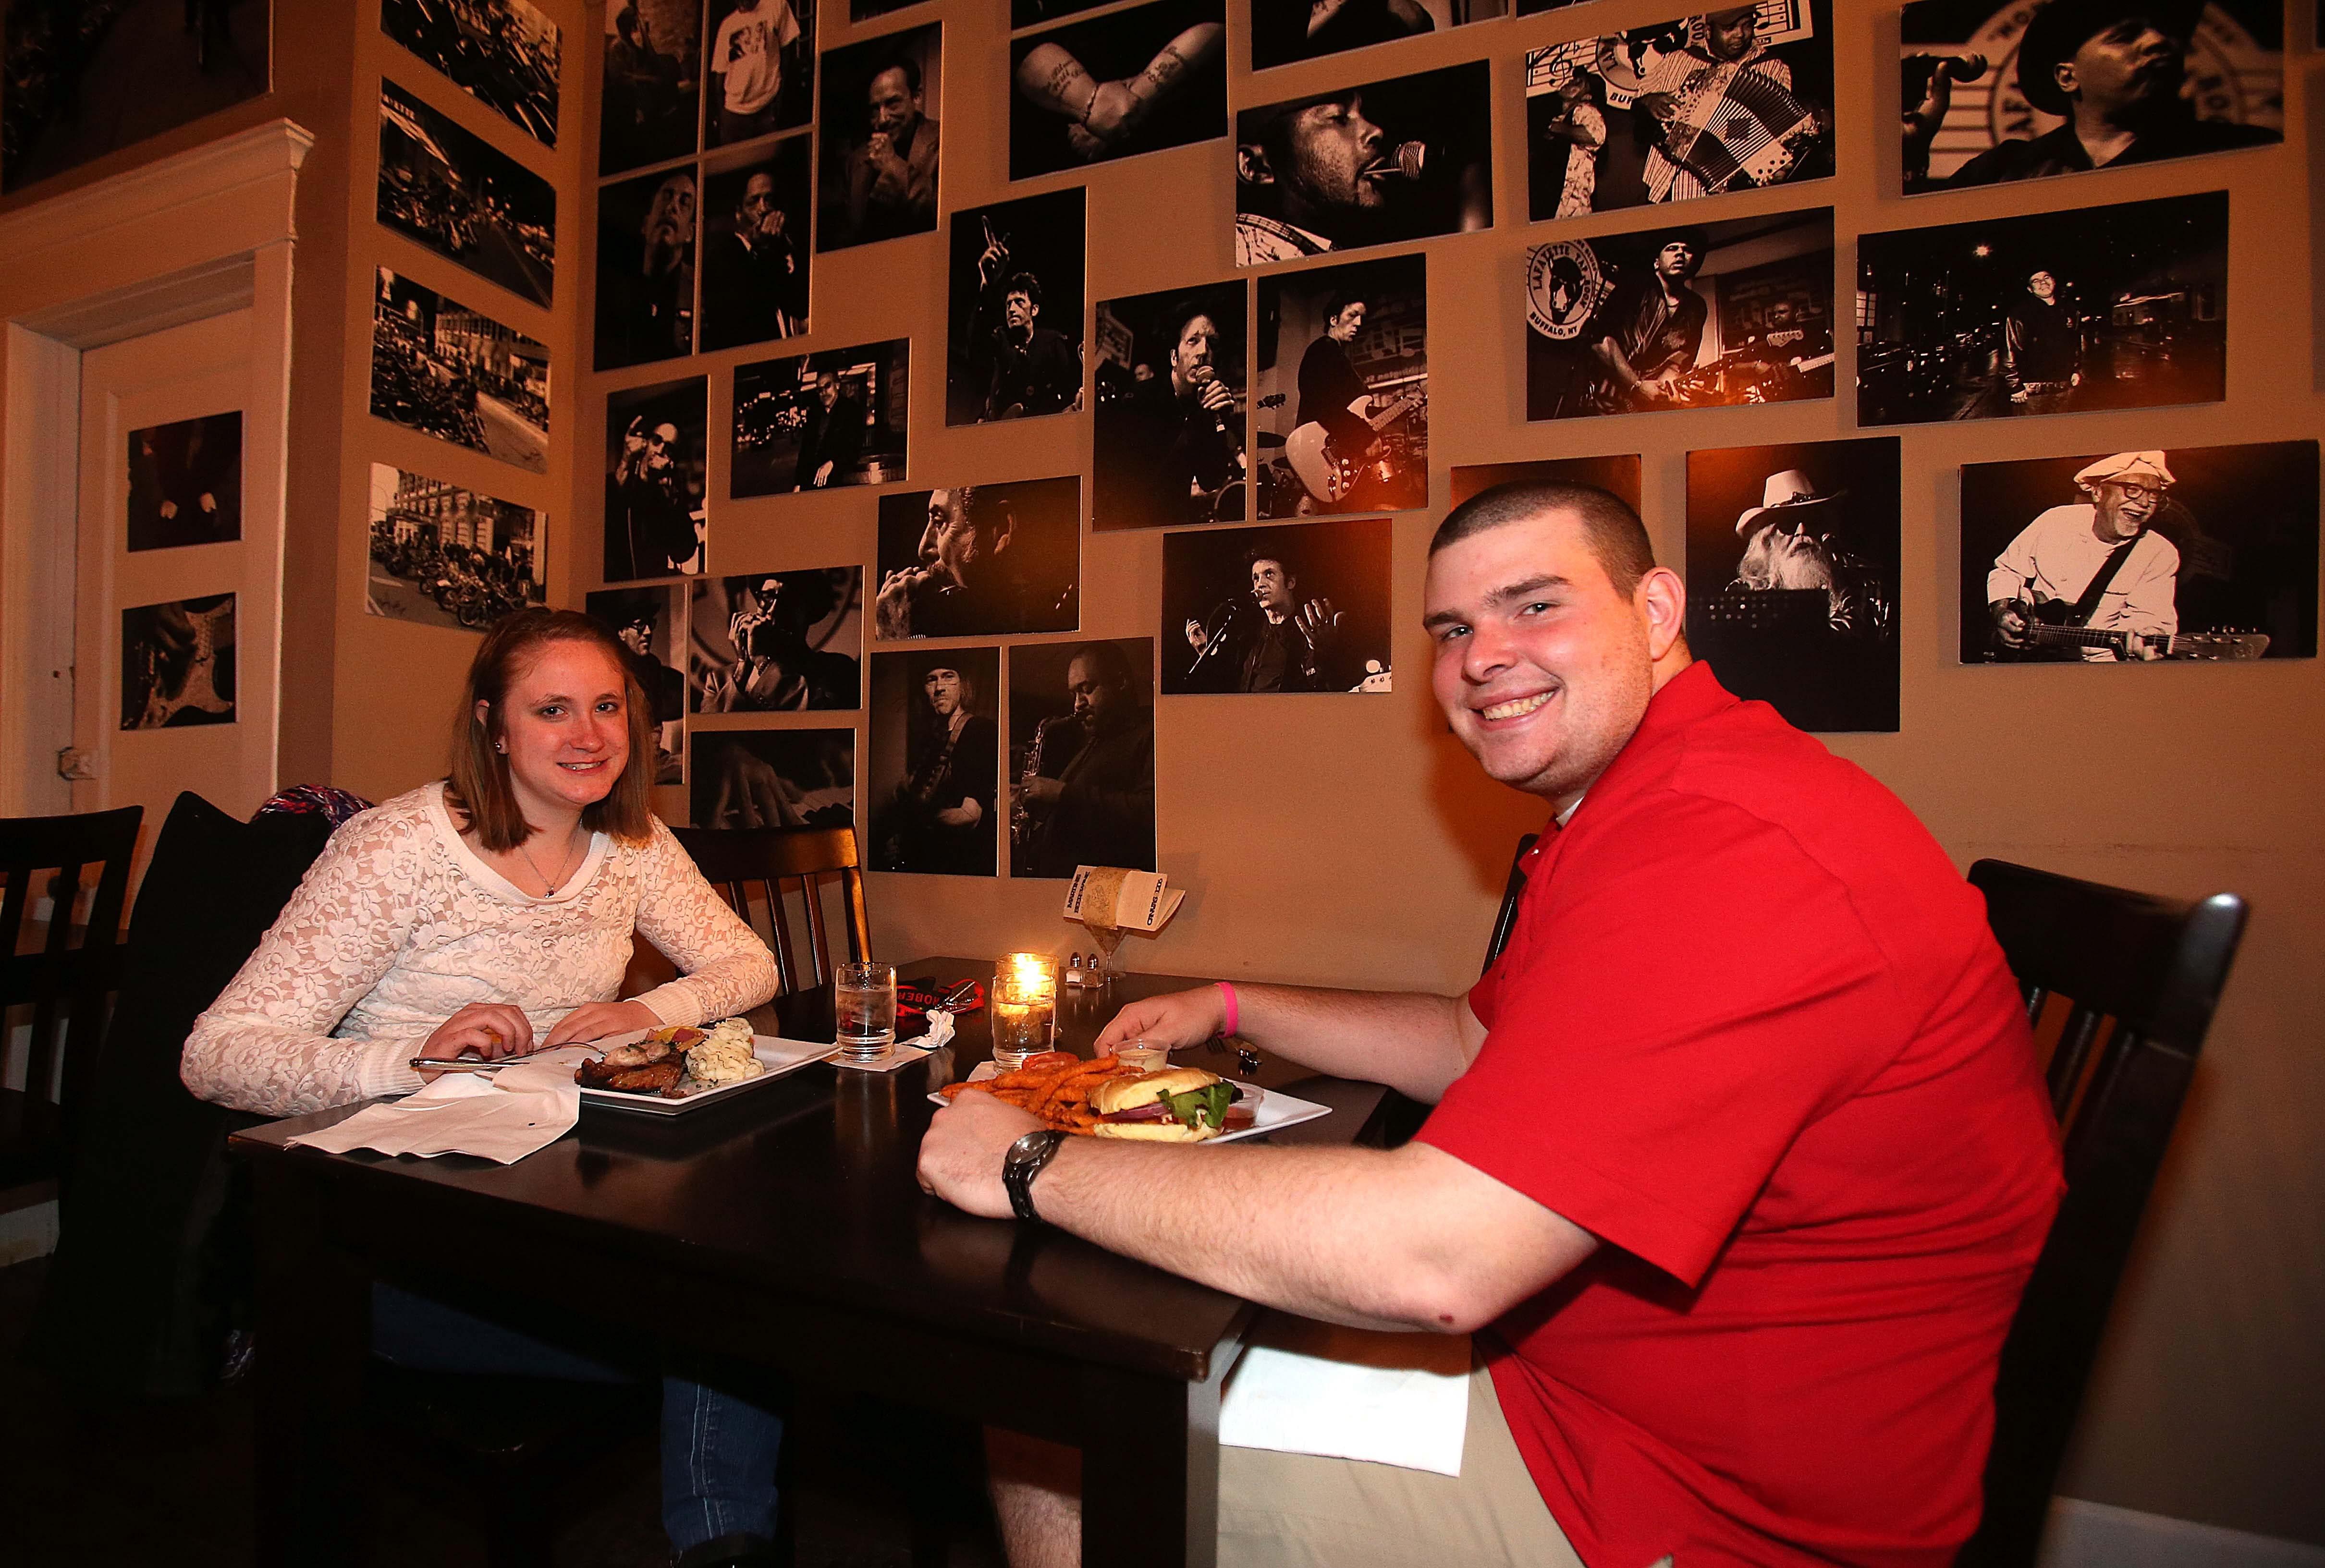 Rebekah Hart and Patrick Leipold enjoy dinner at Canvas@1206 on Hertel Avenue.